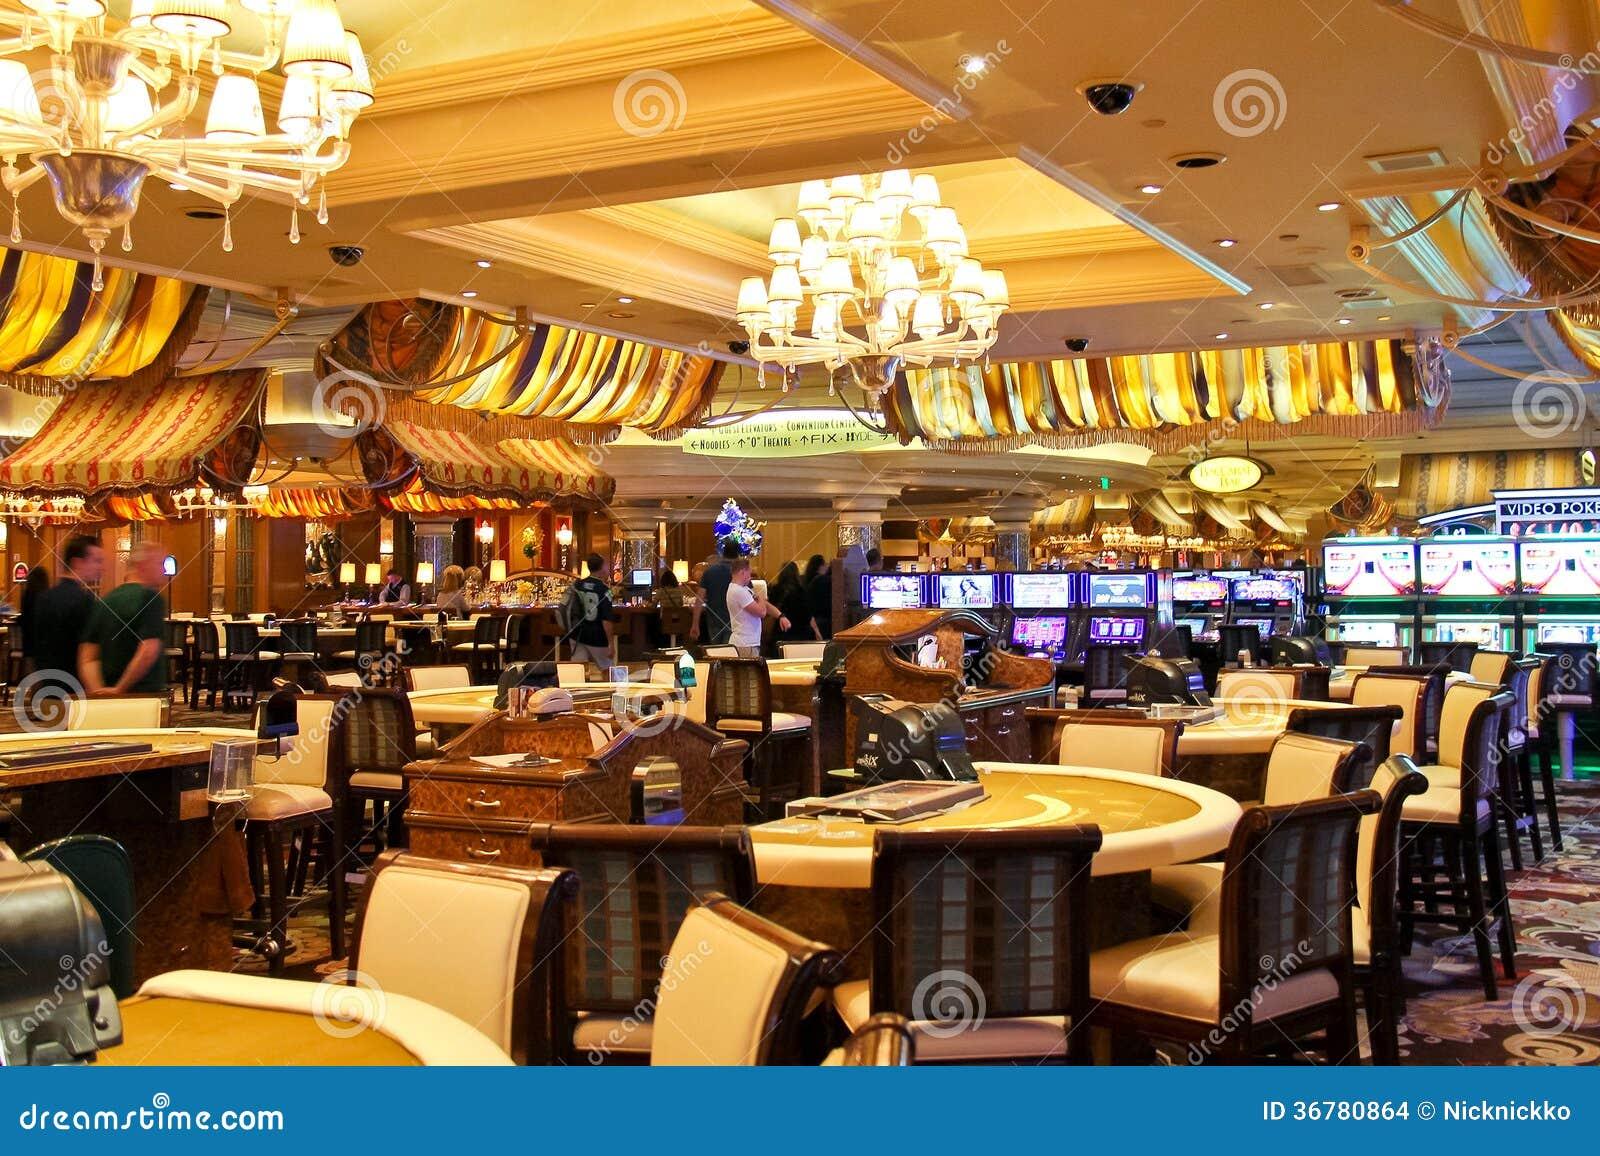 Hotel Bellaggio Las Vegas casino fiesta slot-703472